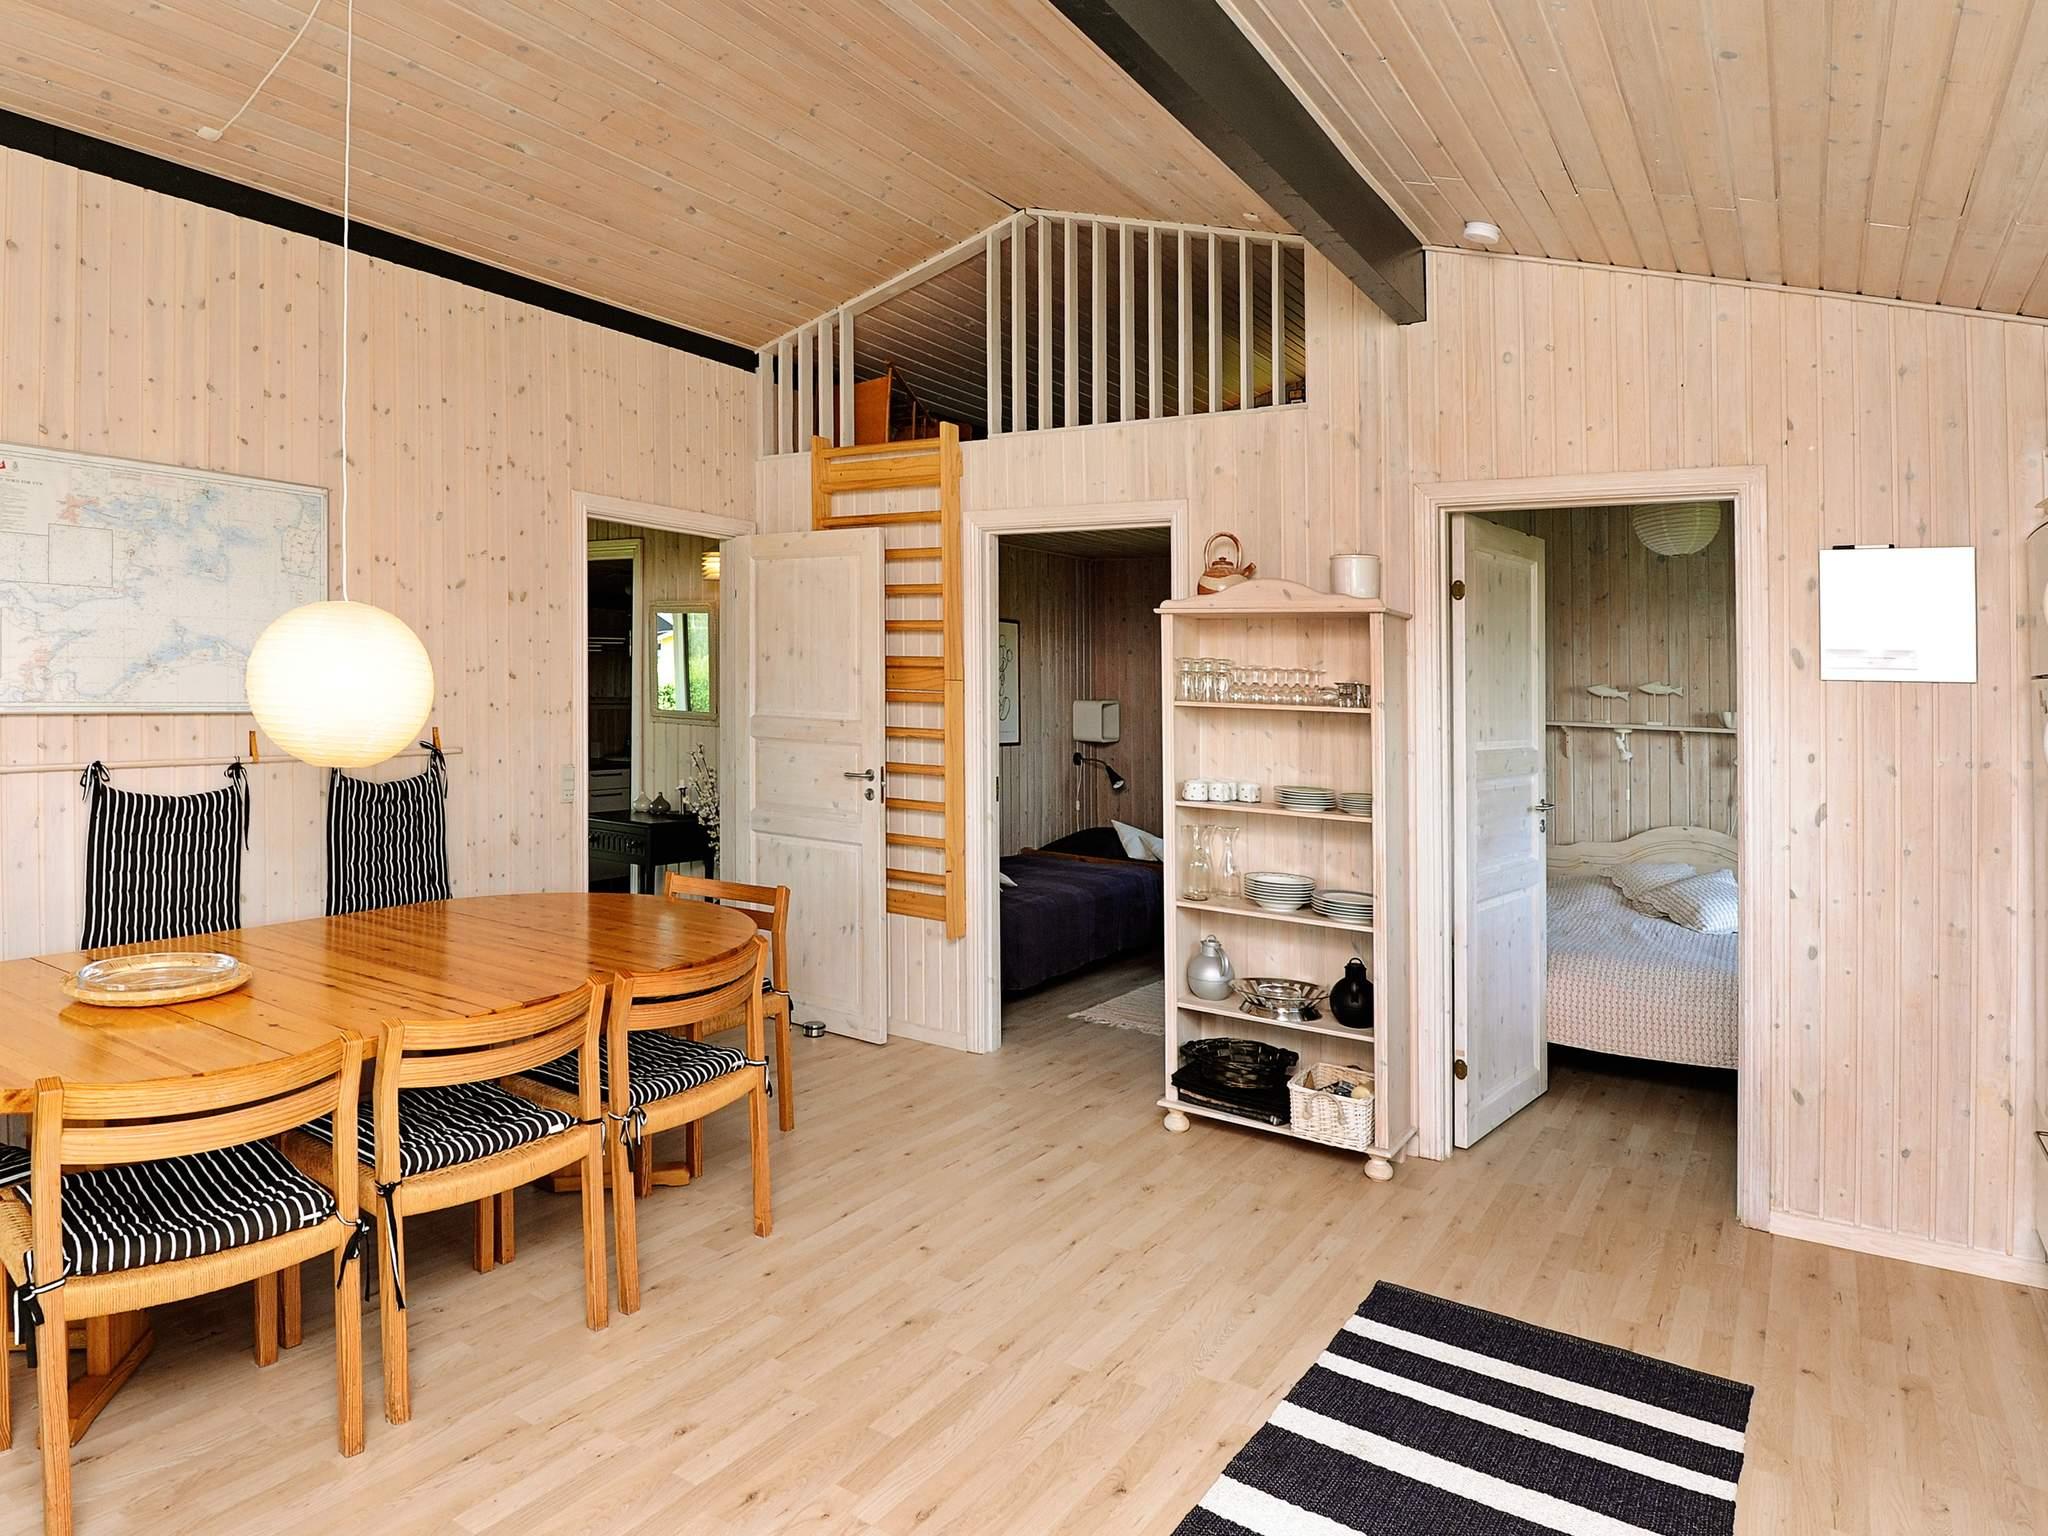 Ferienhaus As Vig (84917), Horsens, , Ostjütland, Dänemark, Bild 6